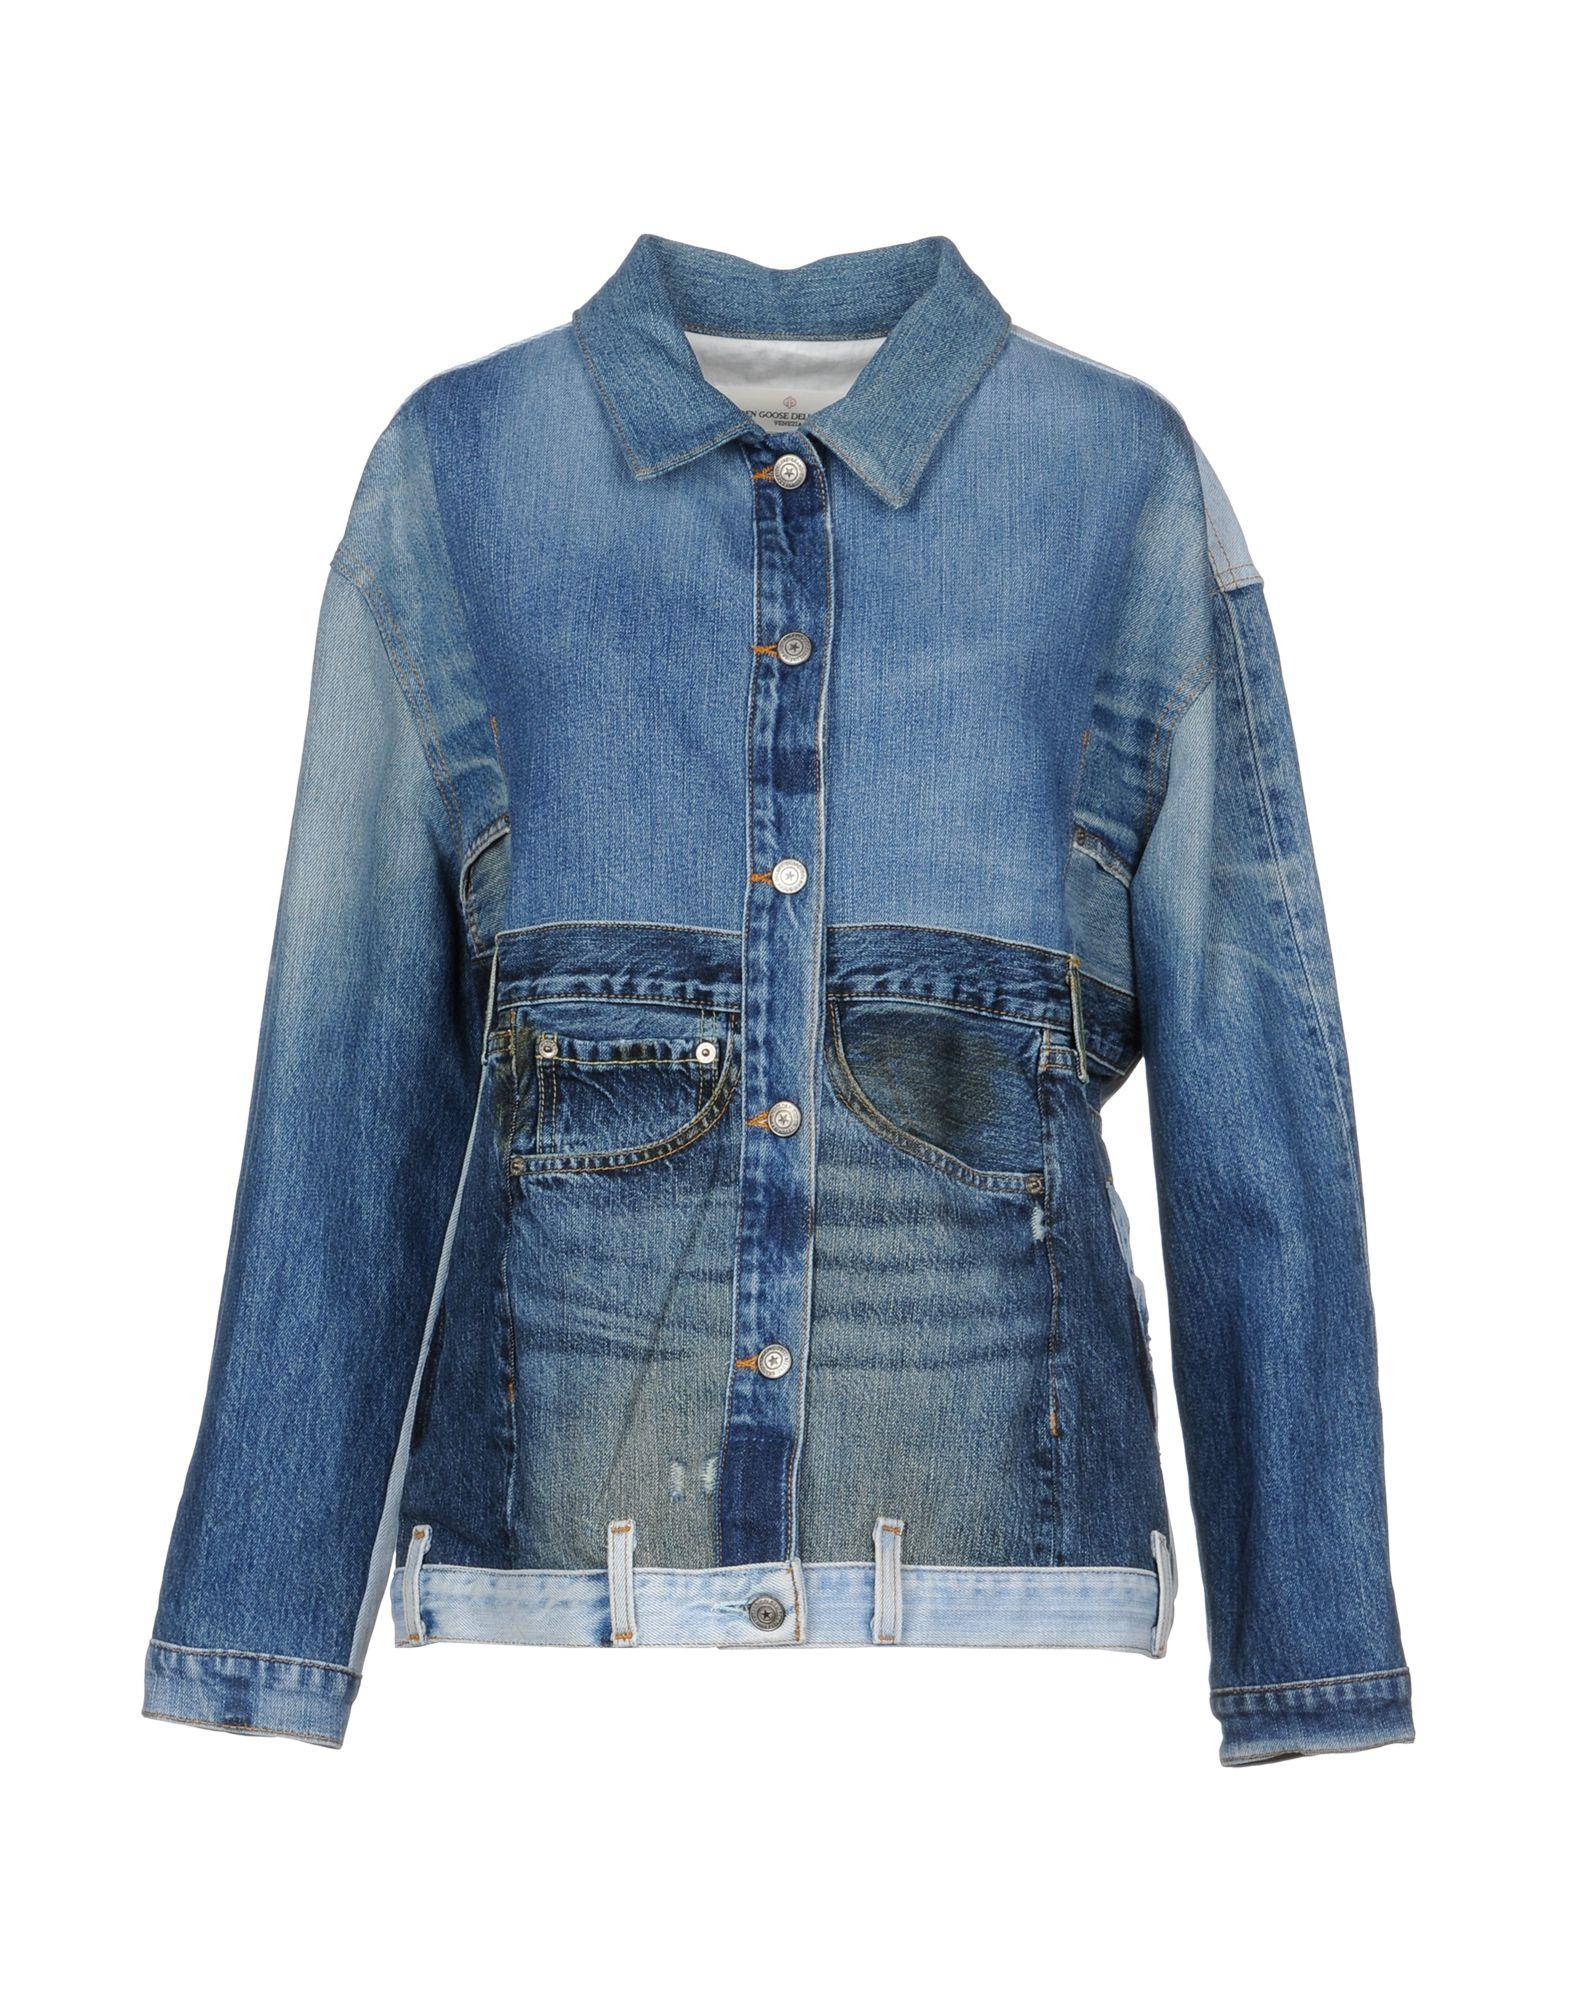 Giubbotto Jeans Golden Goose Deluxe Brand Donna - Acquista online su